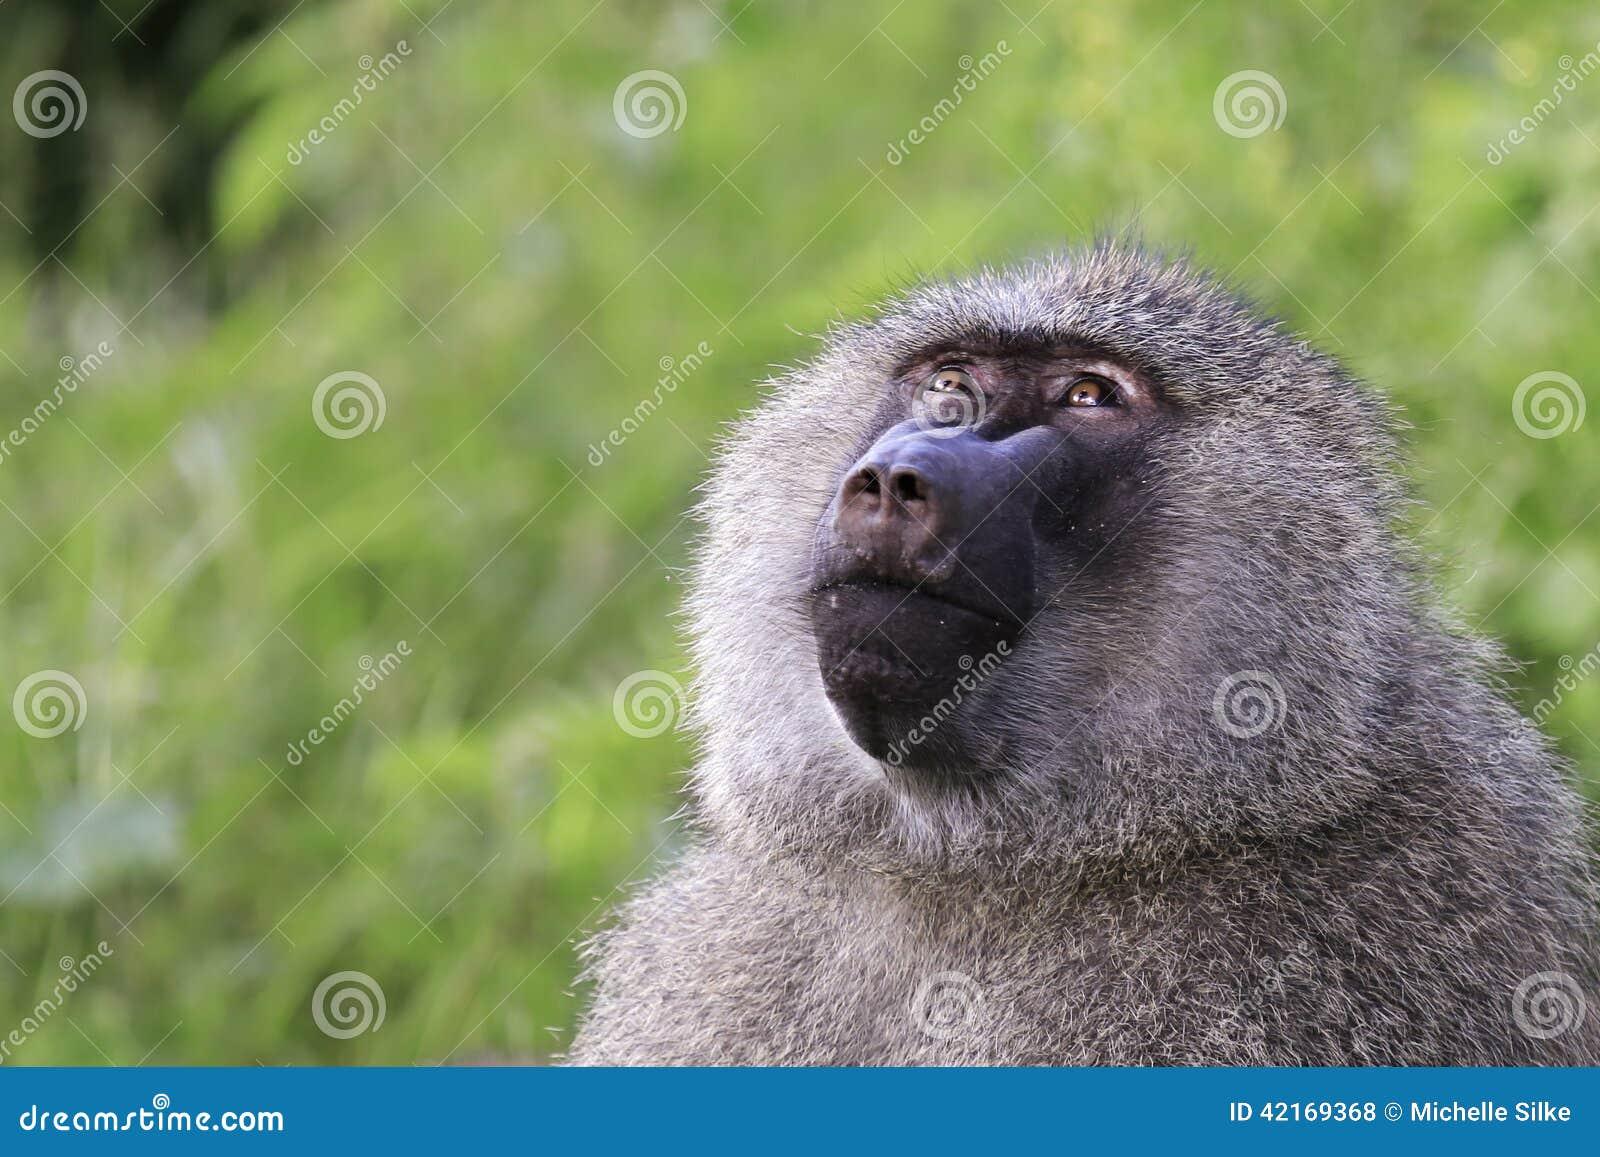 Dusky langur monkeys live in a national park in Thailand | Daily ...